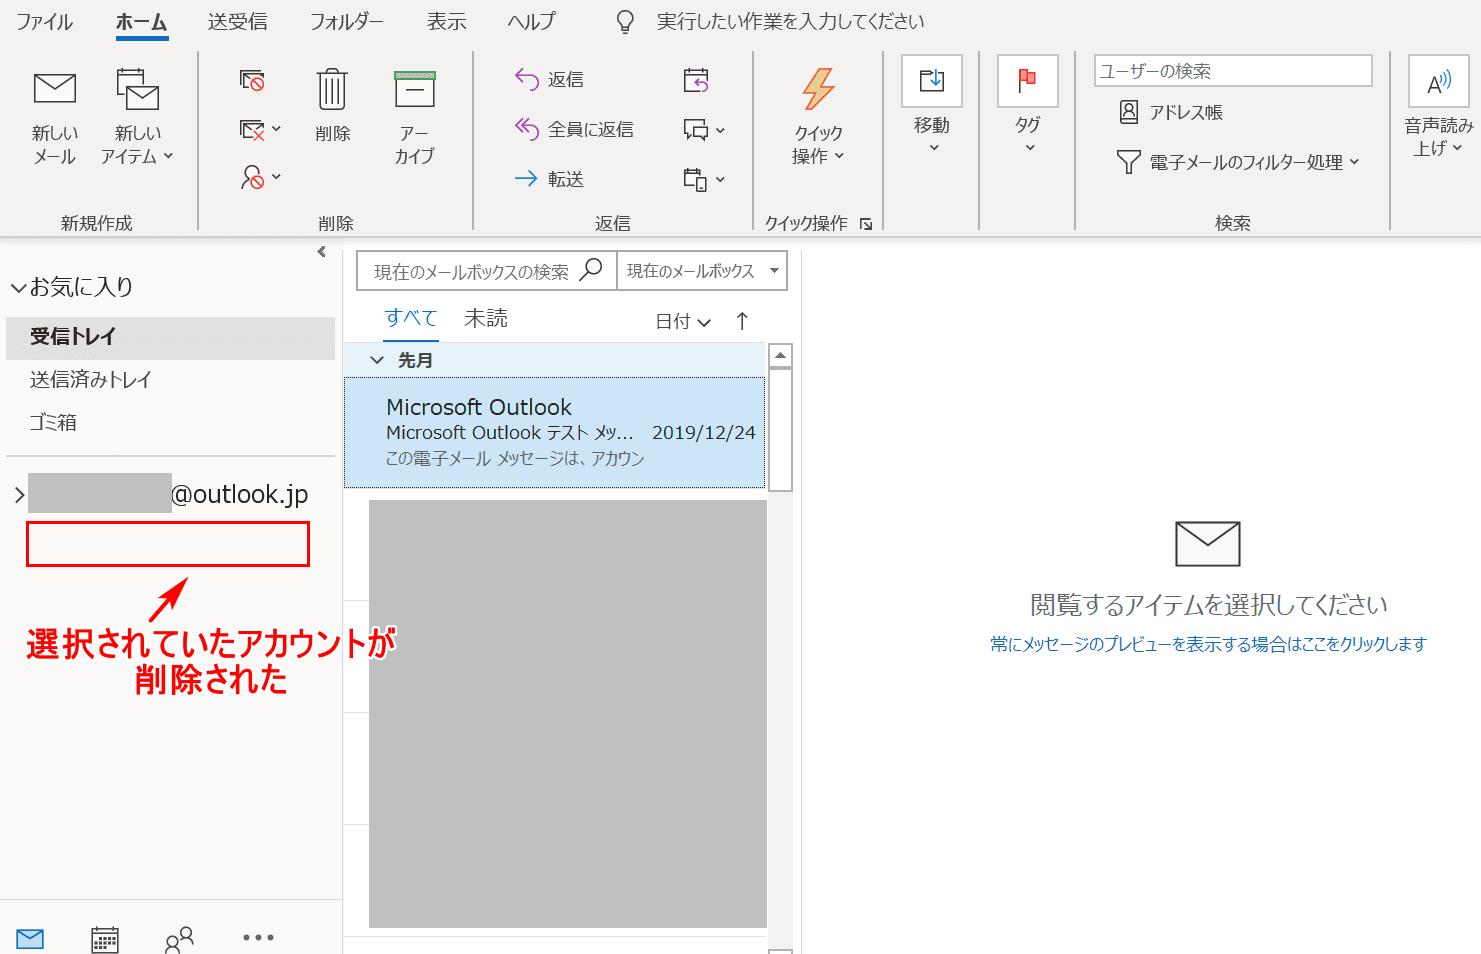 Outlookからのアカウント削除